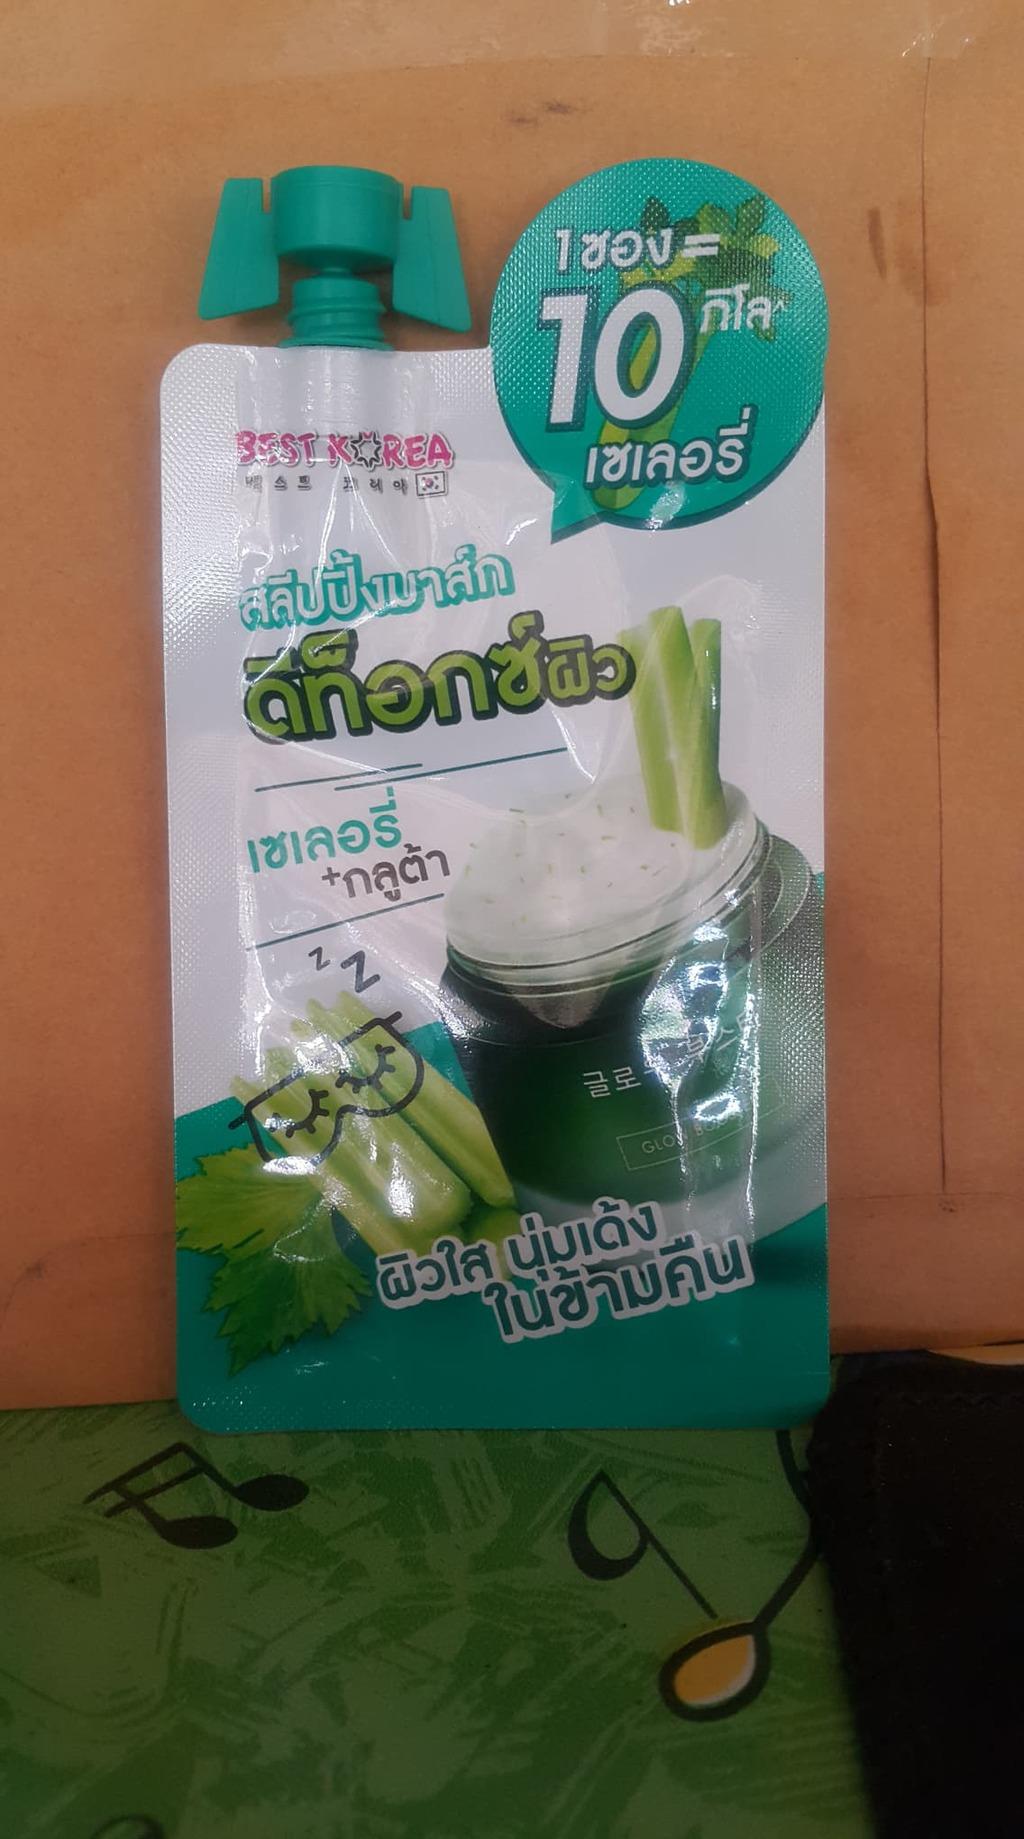 Best Korea Gluta Celery Detox Sleeping Mask รีวิว